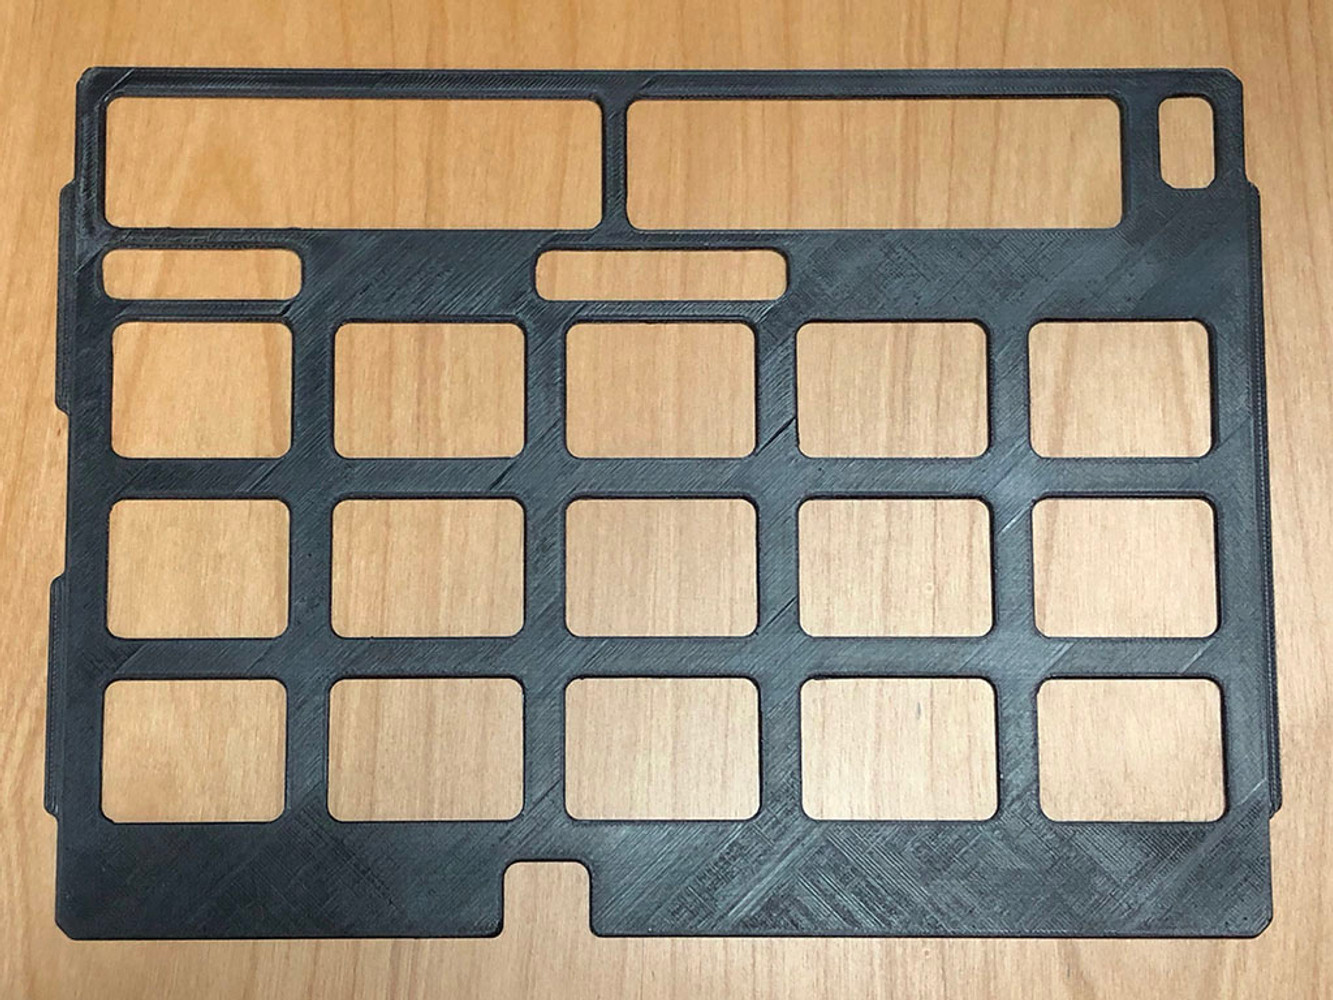 3D Printed Keyguards